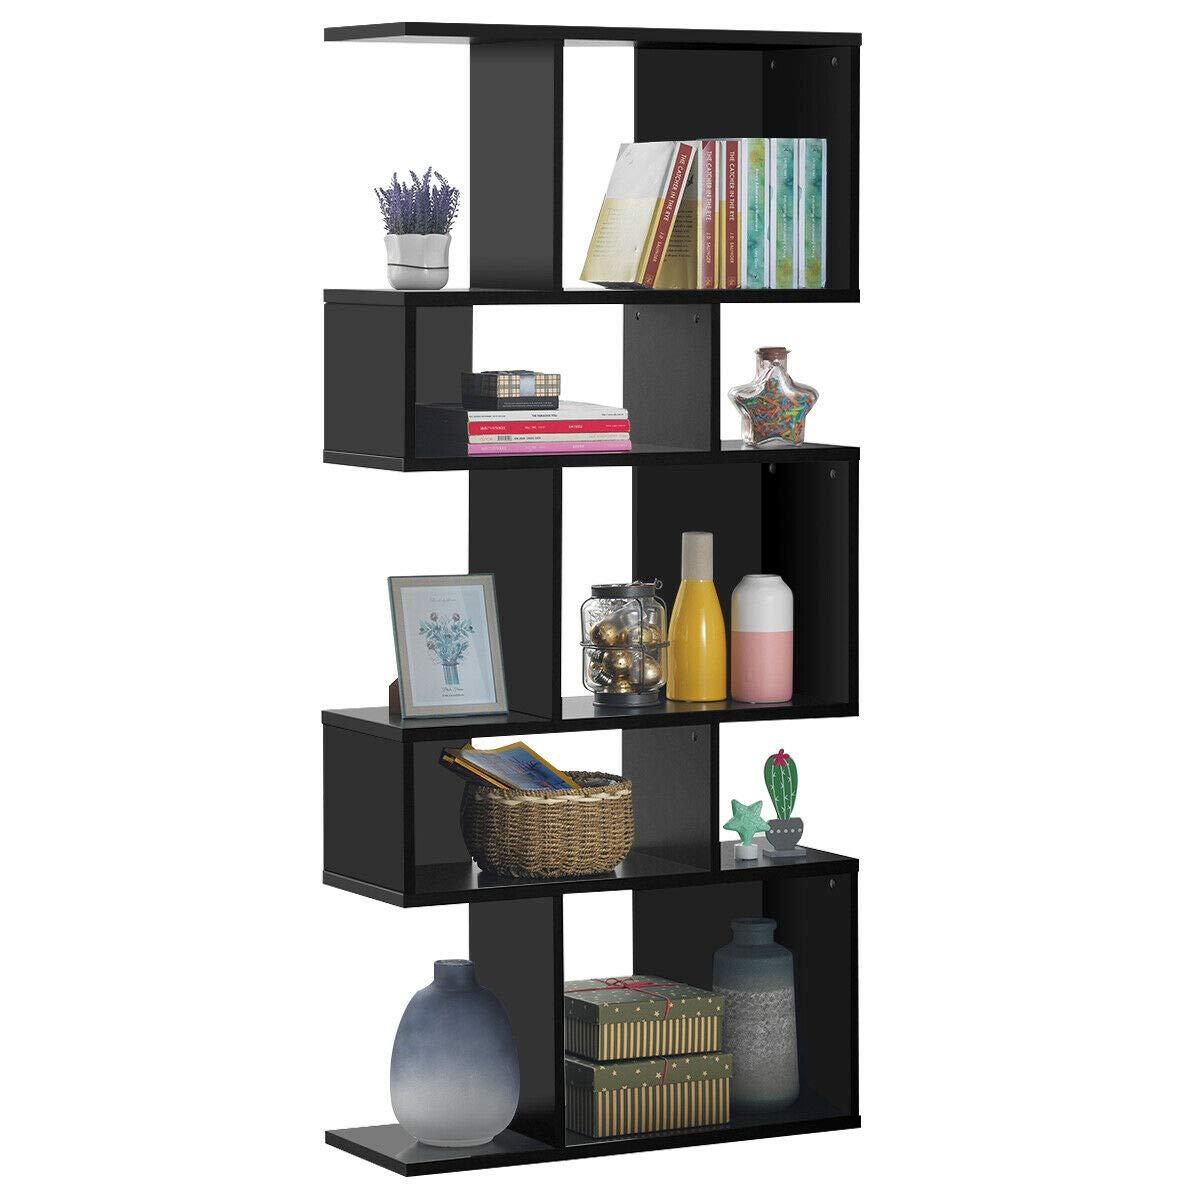 Giantex Freestanding Ladder Bookcase, 5 Cubes Corner Storage Bookshelf, 5-Layer Shelves Closet Organizer Rack Display Cabinet Black